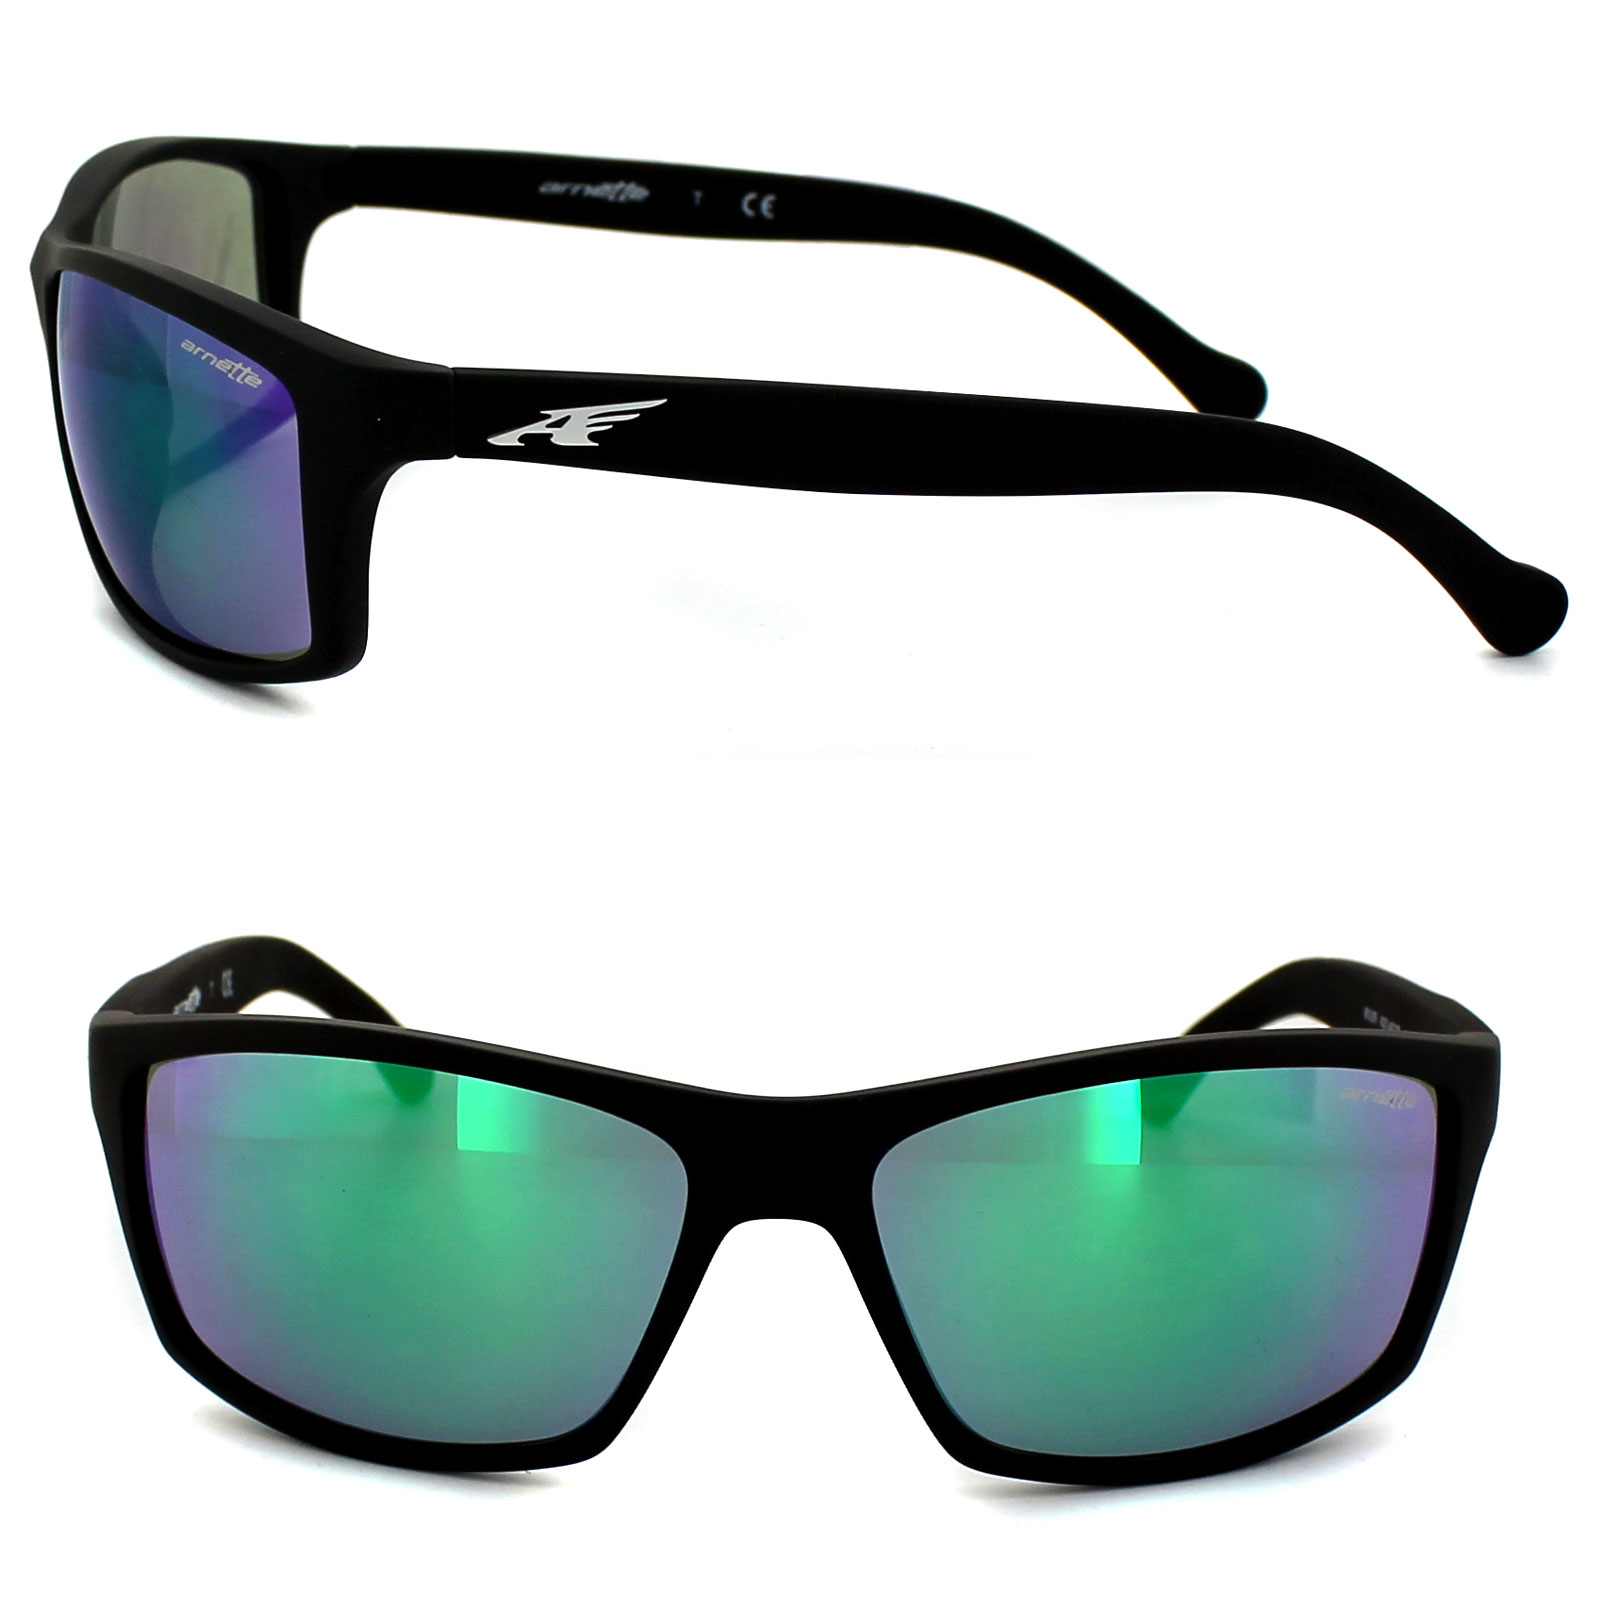 51c096737a3 Arnette Sunglasses 4207 Boiler 447 3R Fuzzy Black Citrus Chrome ...